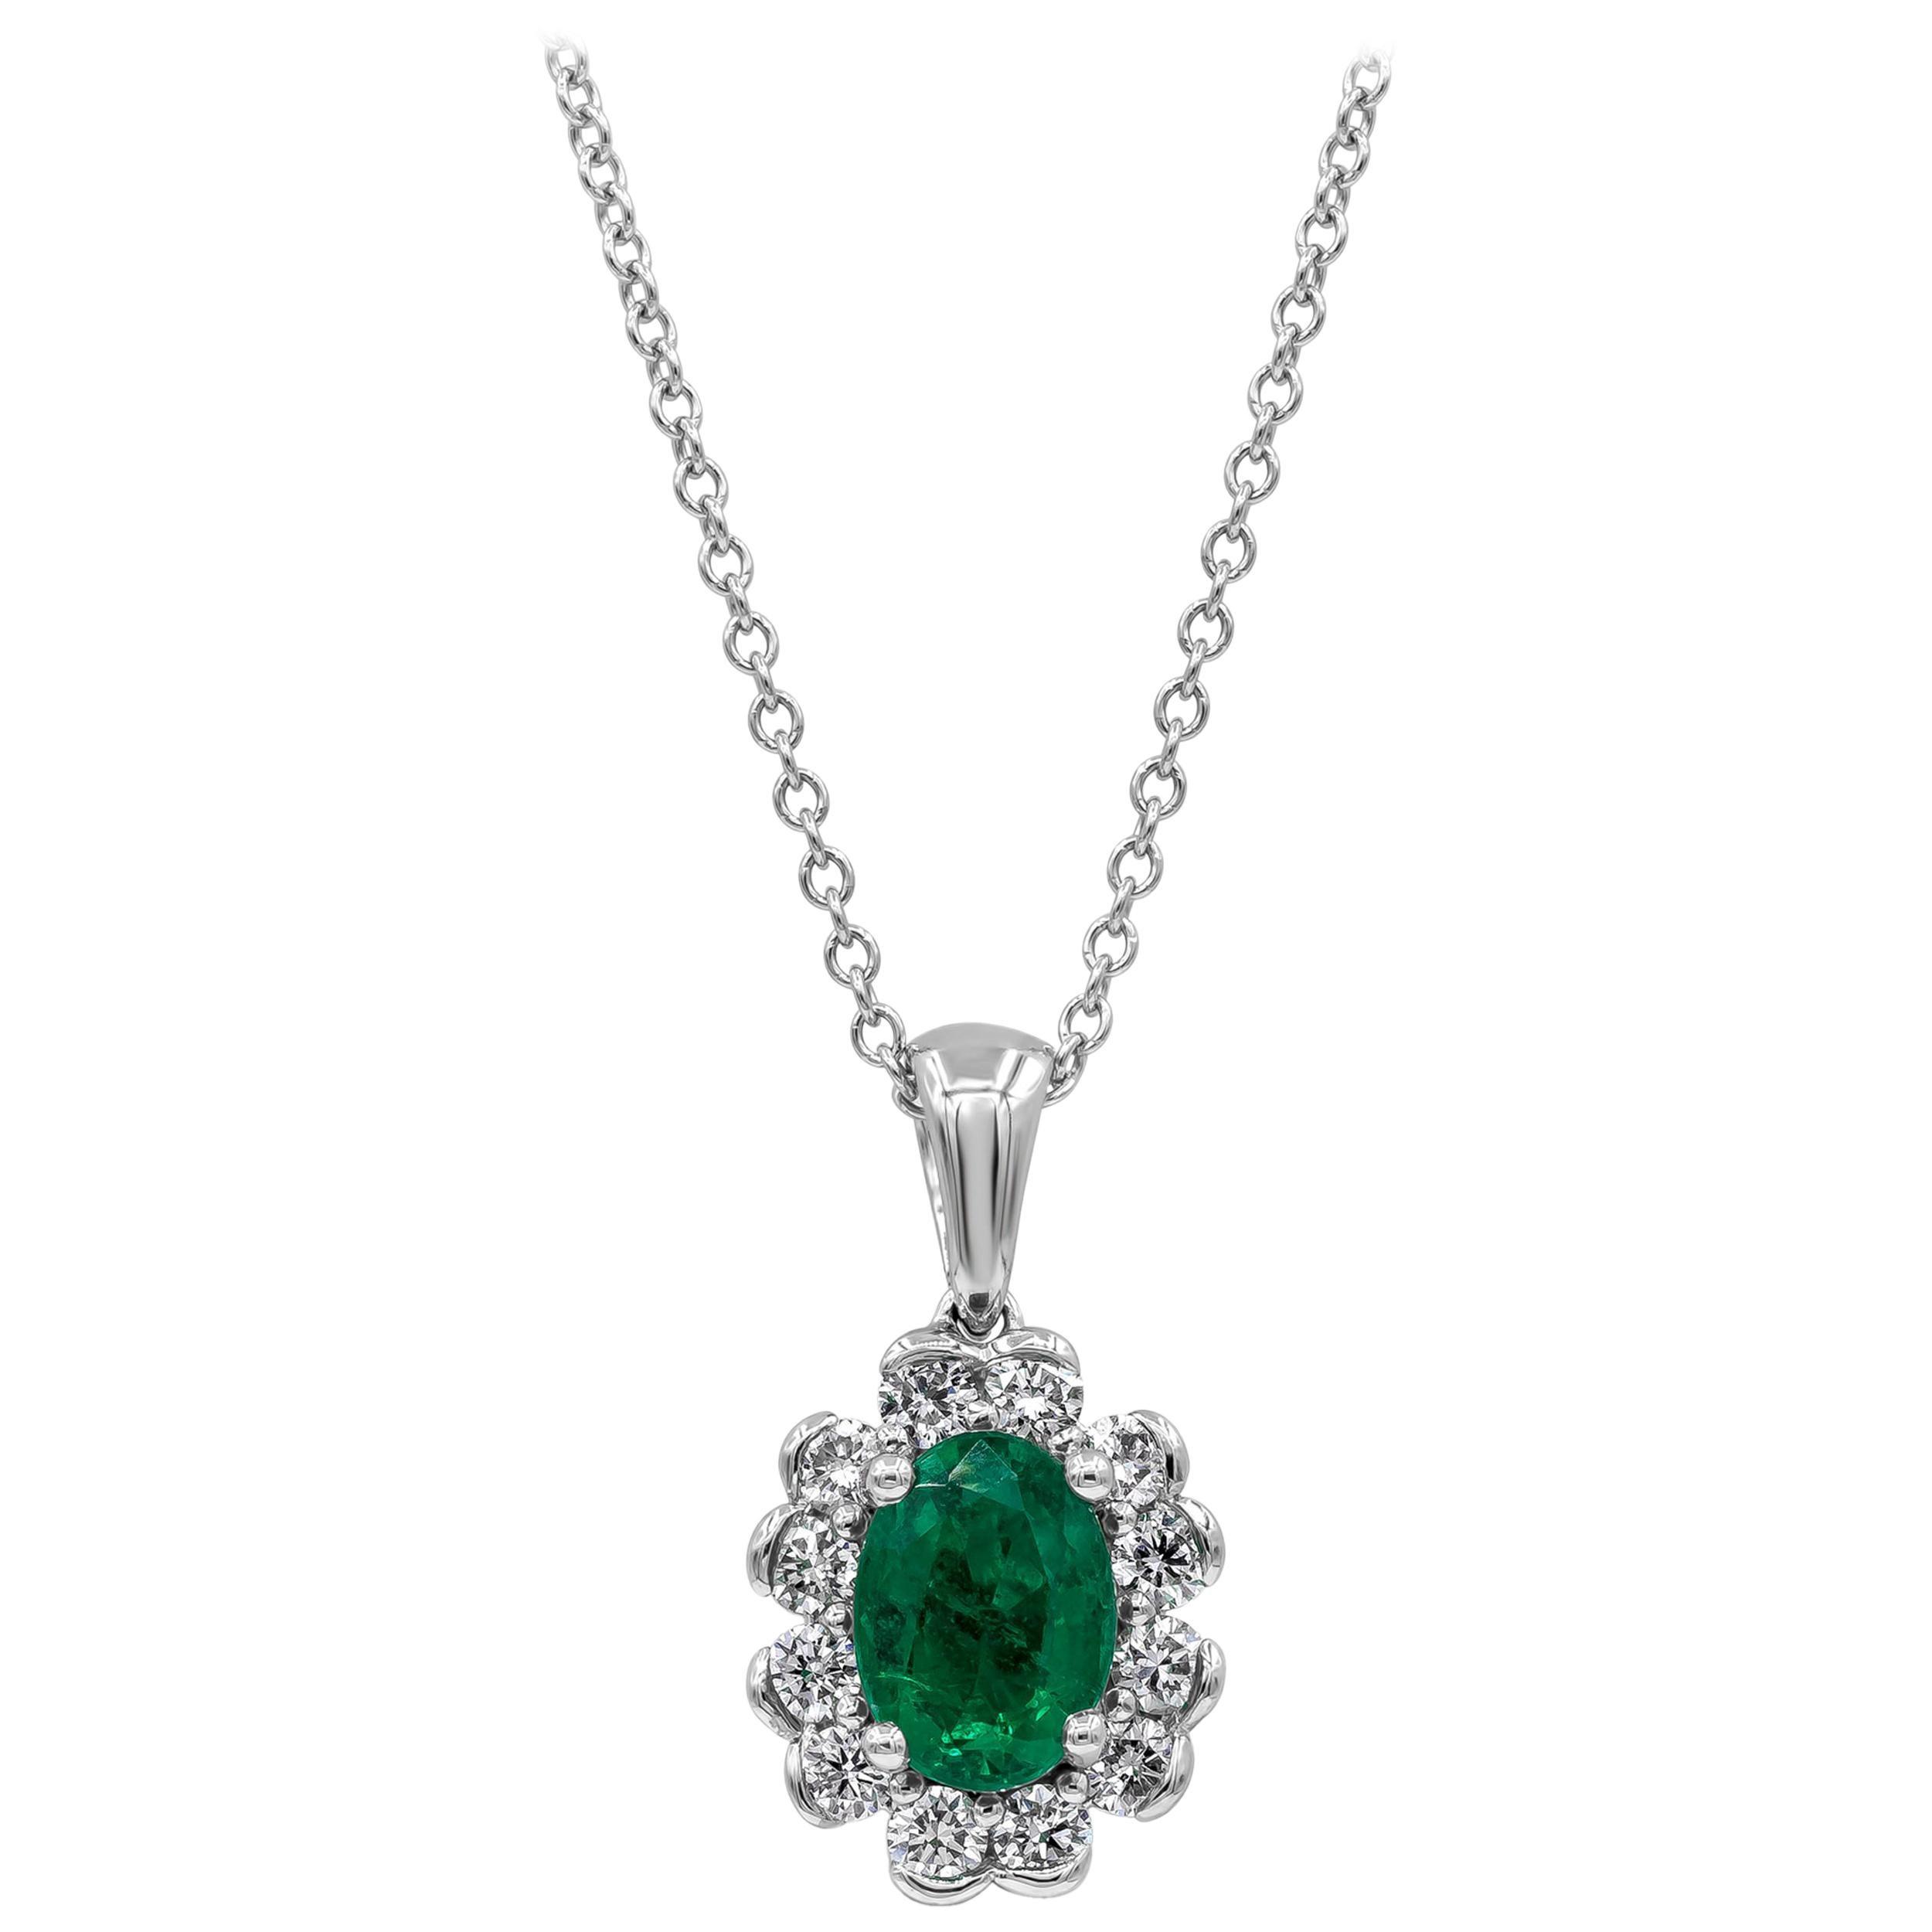 Roman Malakov Green Emerald and Diamond Halo Pendant Necklace